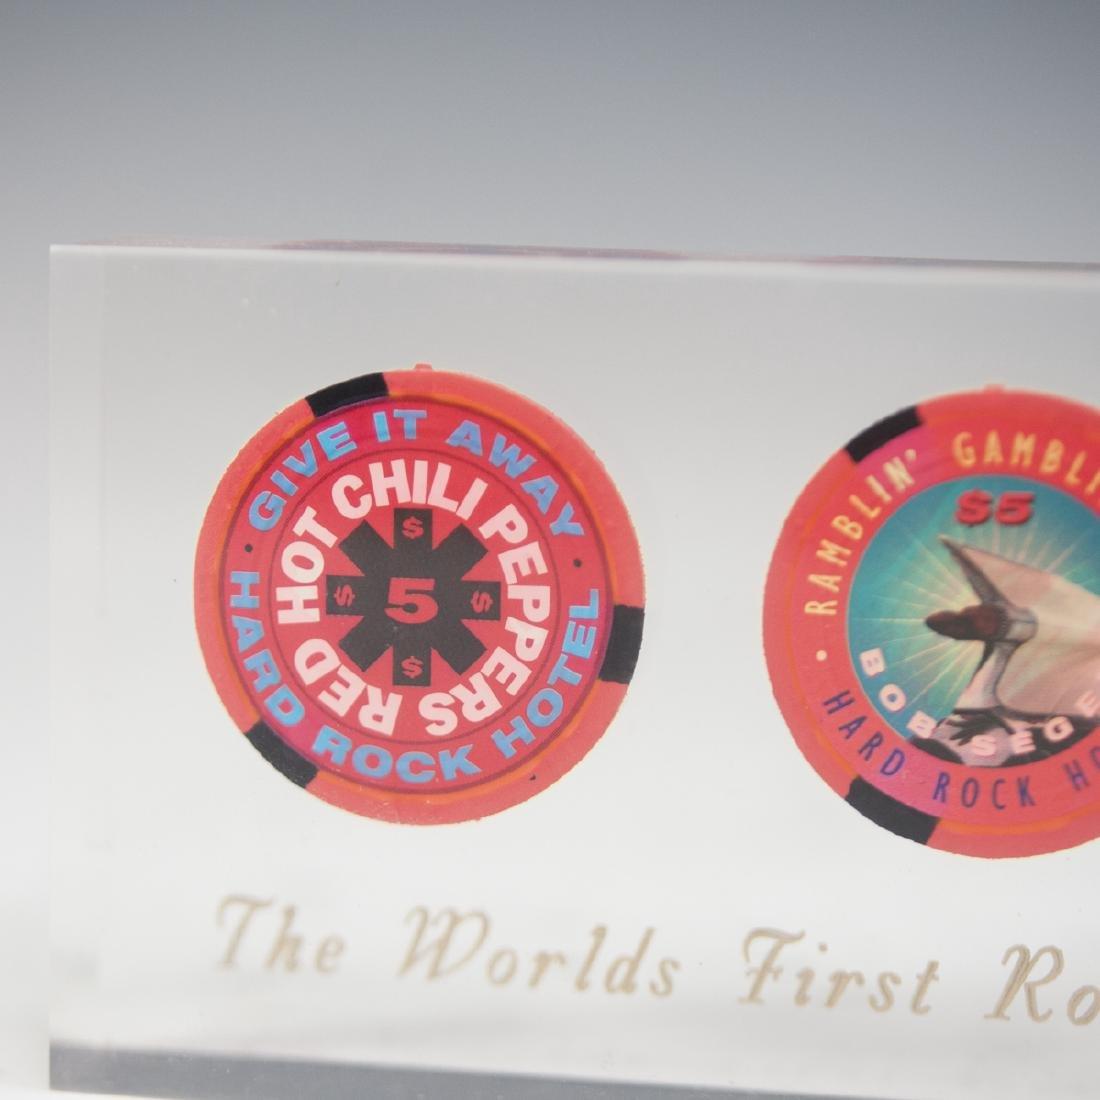 Hard Rock Hotel Casino Chip Set - 2